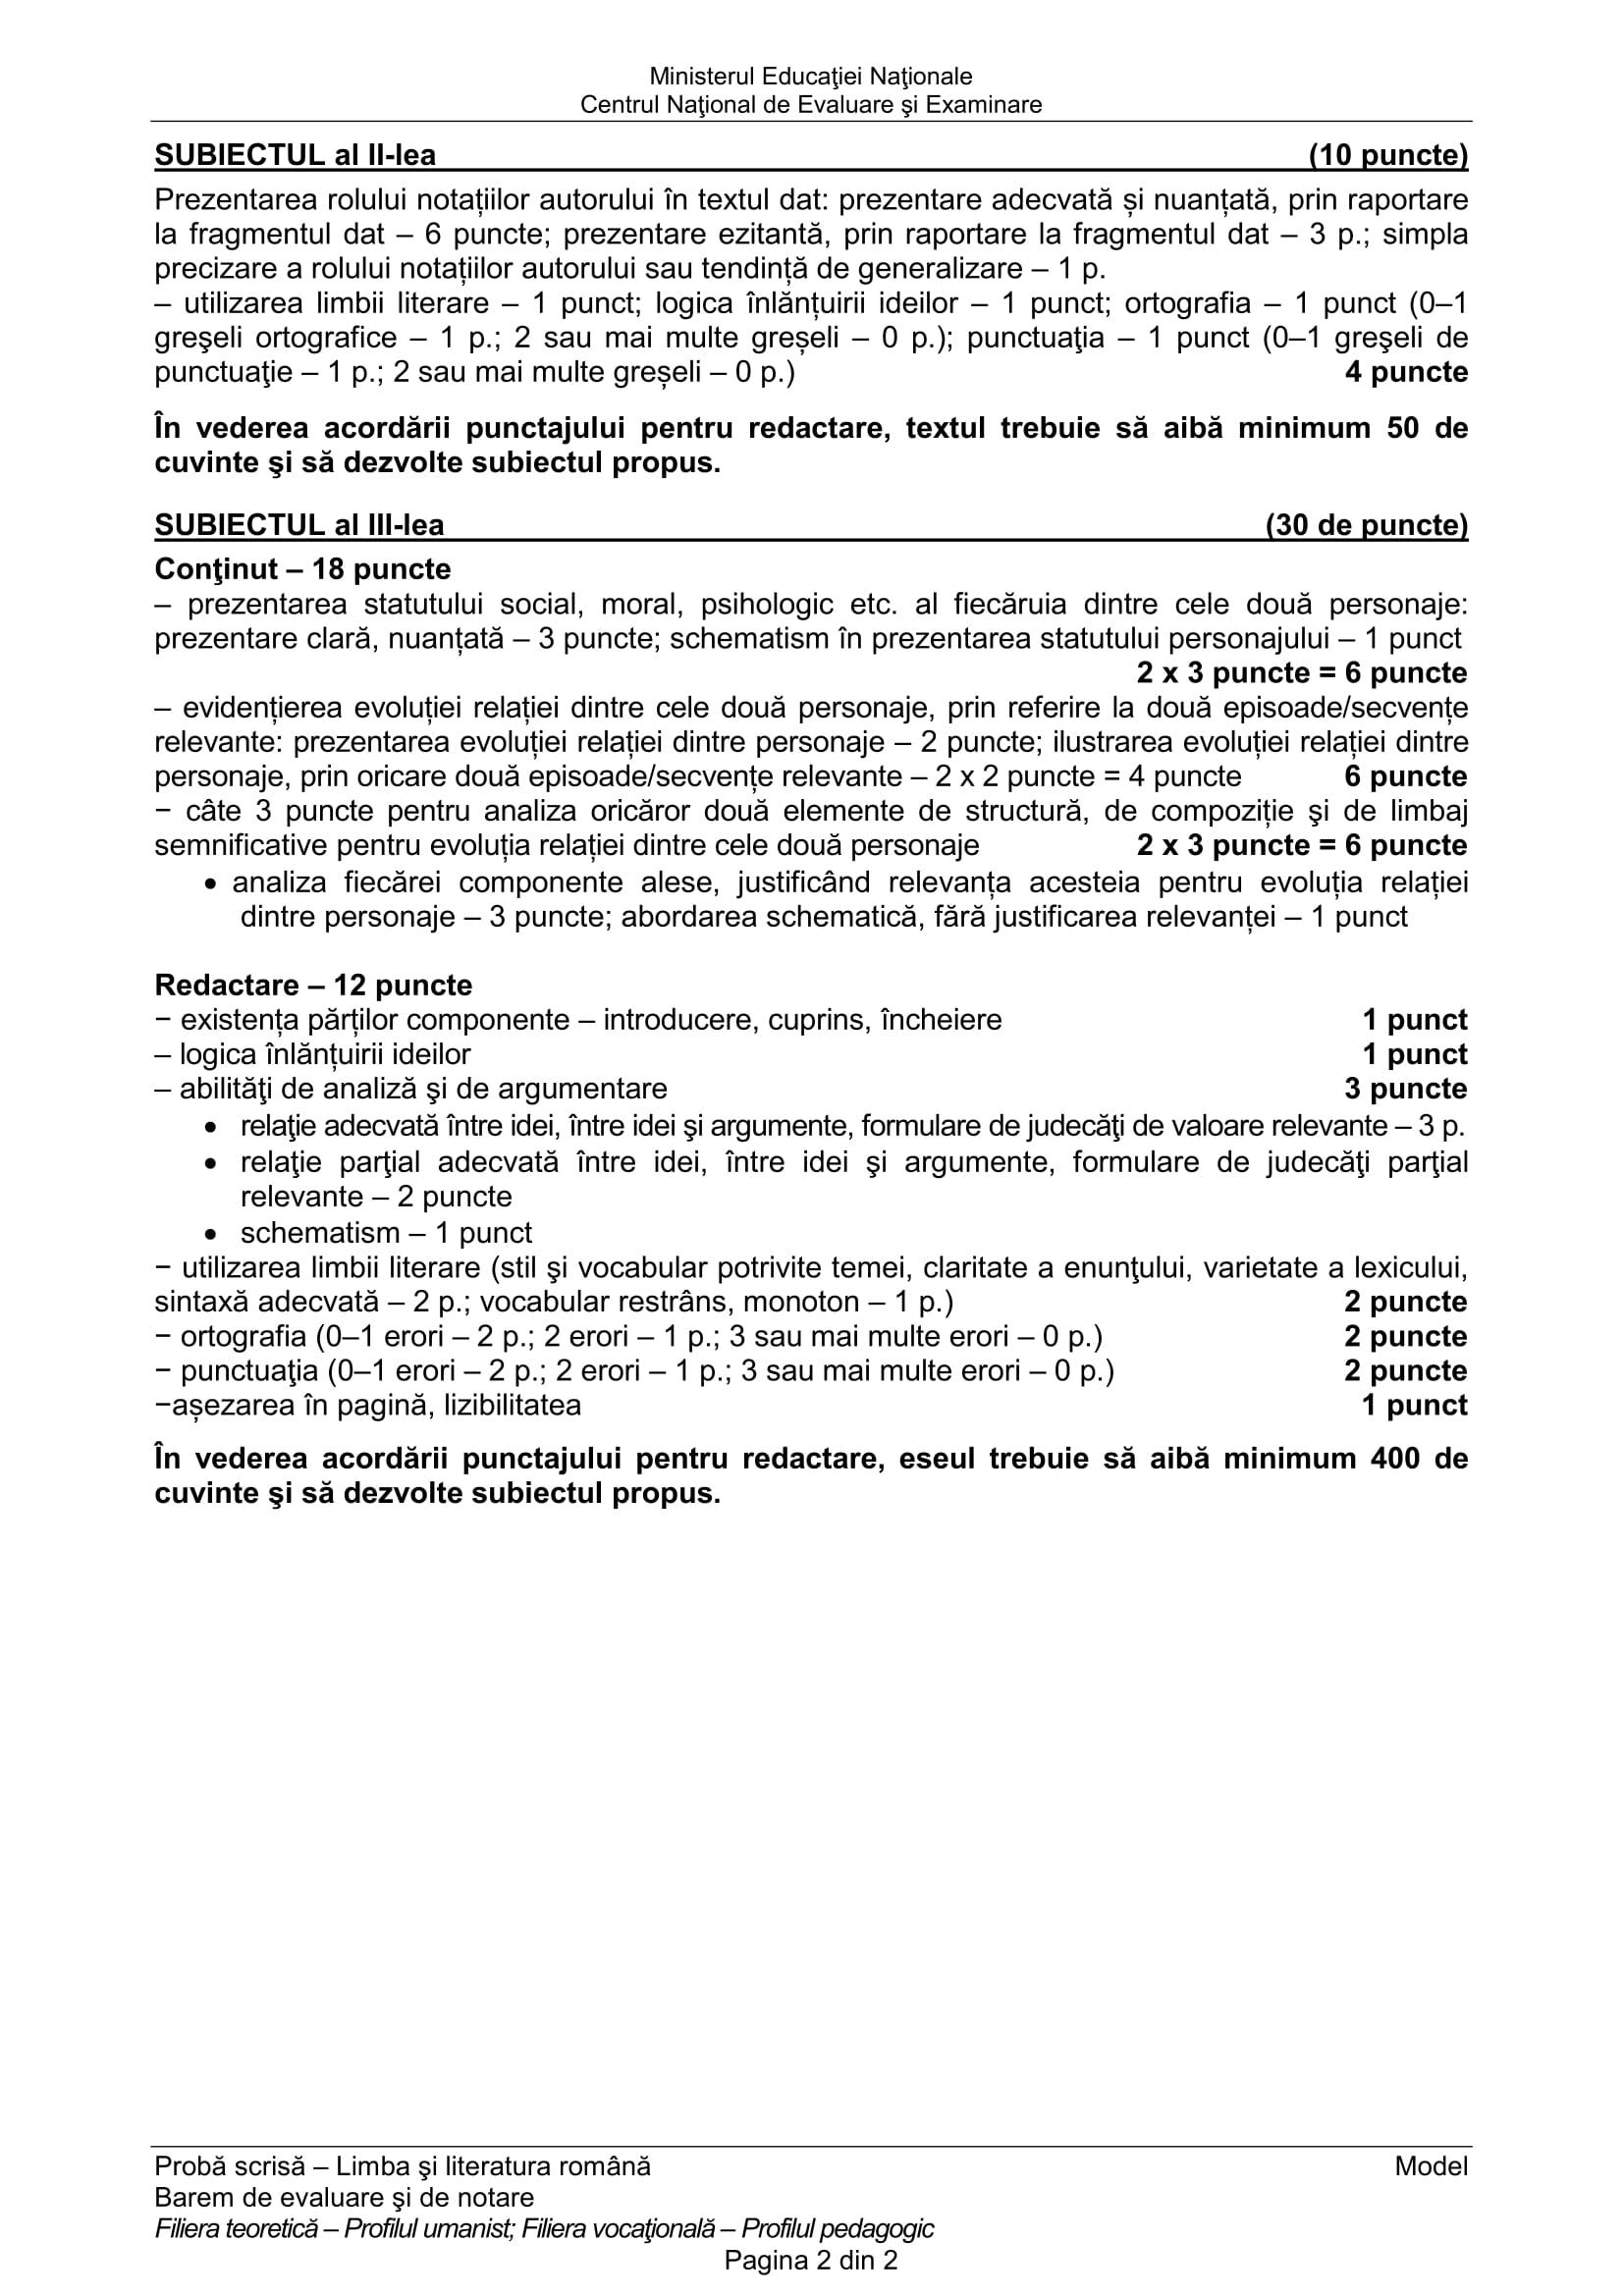 E_a_romana_uman_ped_2018_bar_model-2